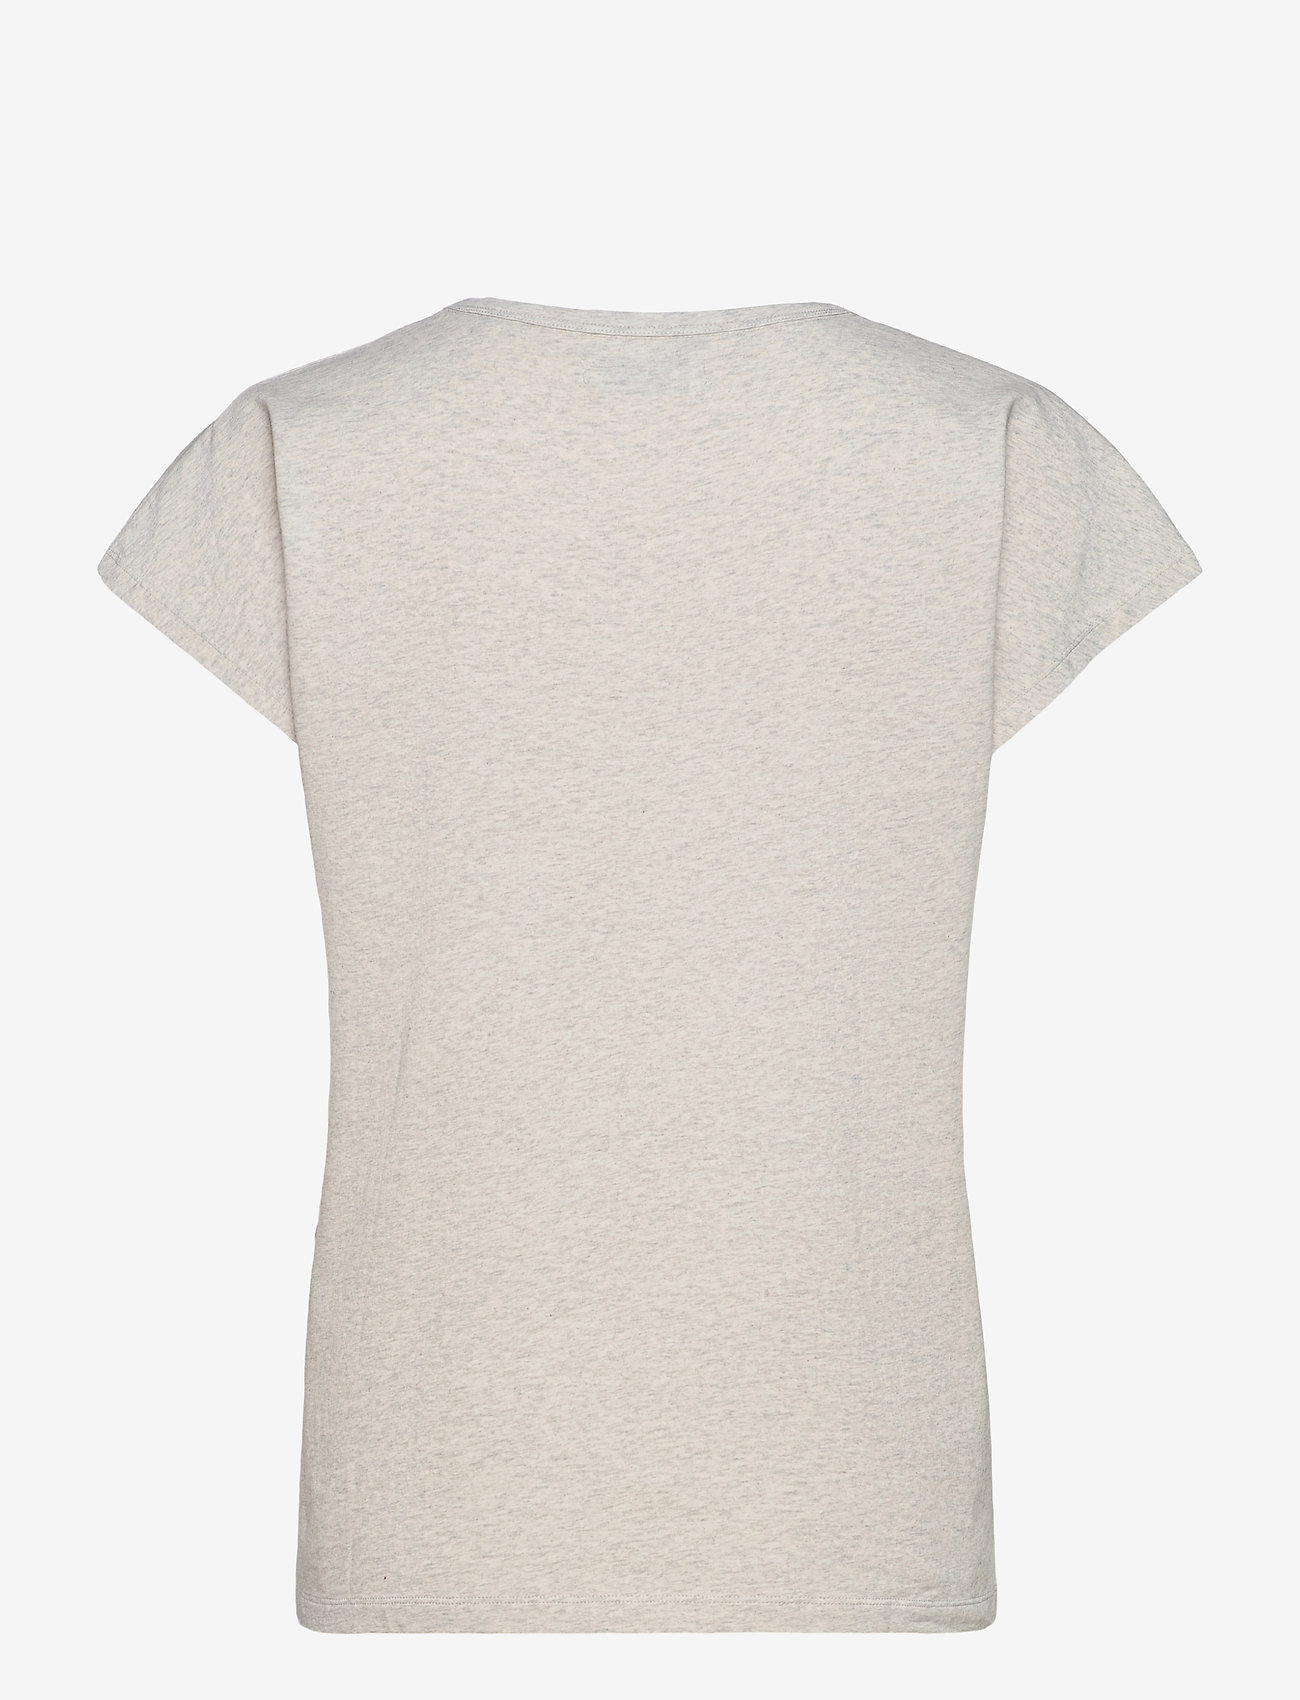 Arnie Says - Hadley Cotton - t-shirt & tops - lt grey melange - 1